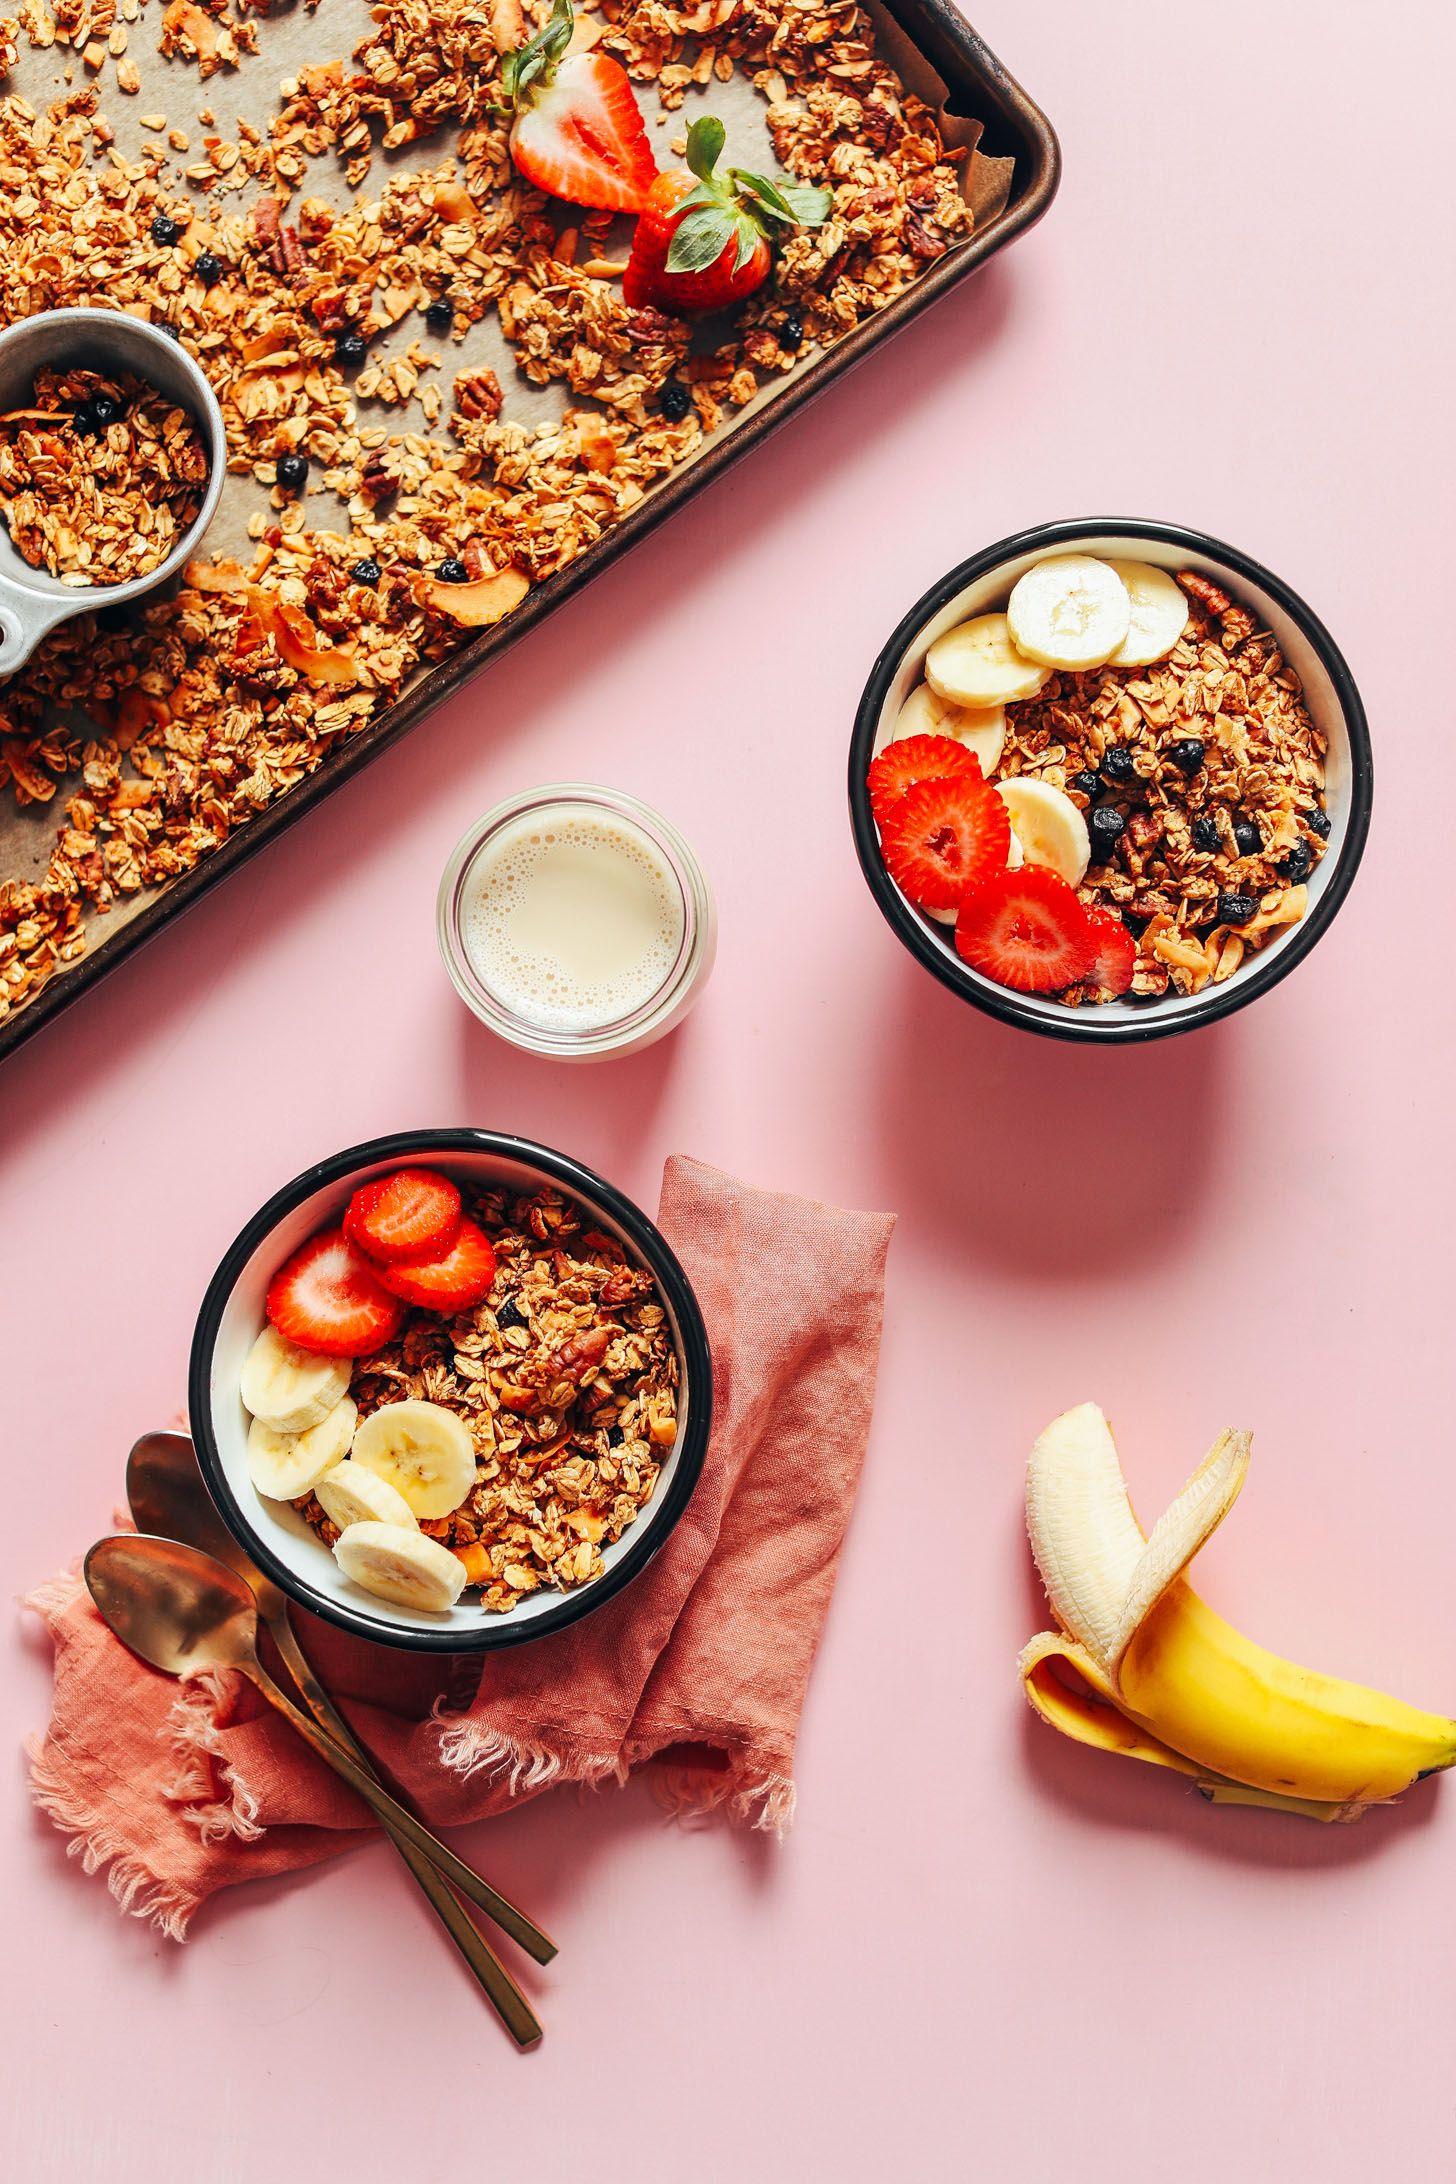 Easy Vegan Oil Free Granola Minimalist Baker Recipes Recipe In 2020 Oil Free Vegan Aquafaba Easy Vegan